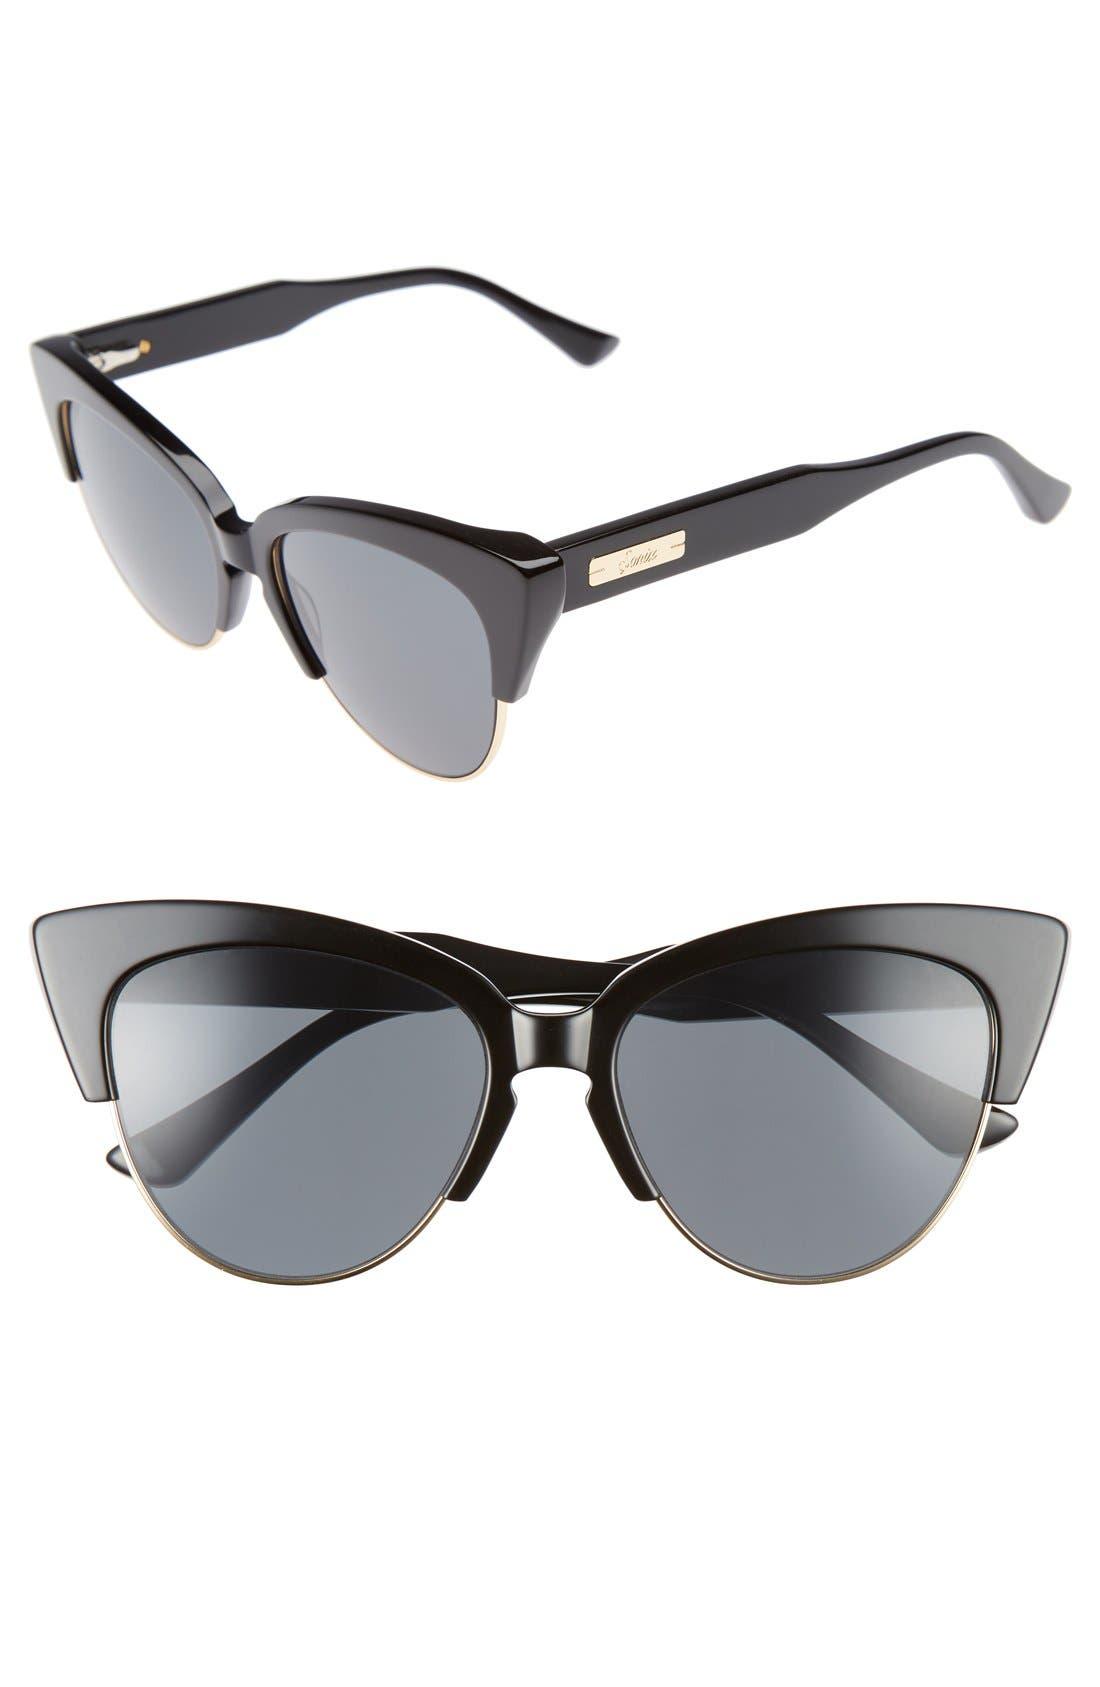 Dafni 56mm Gradient Cat Eye Sunglasses,                             Main thumbnail 1, color,